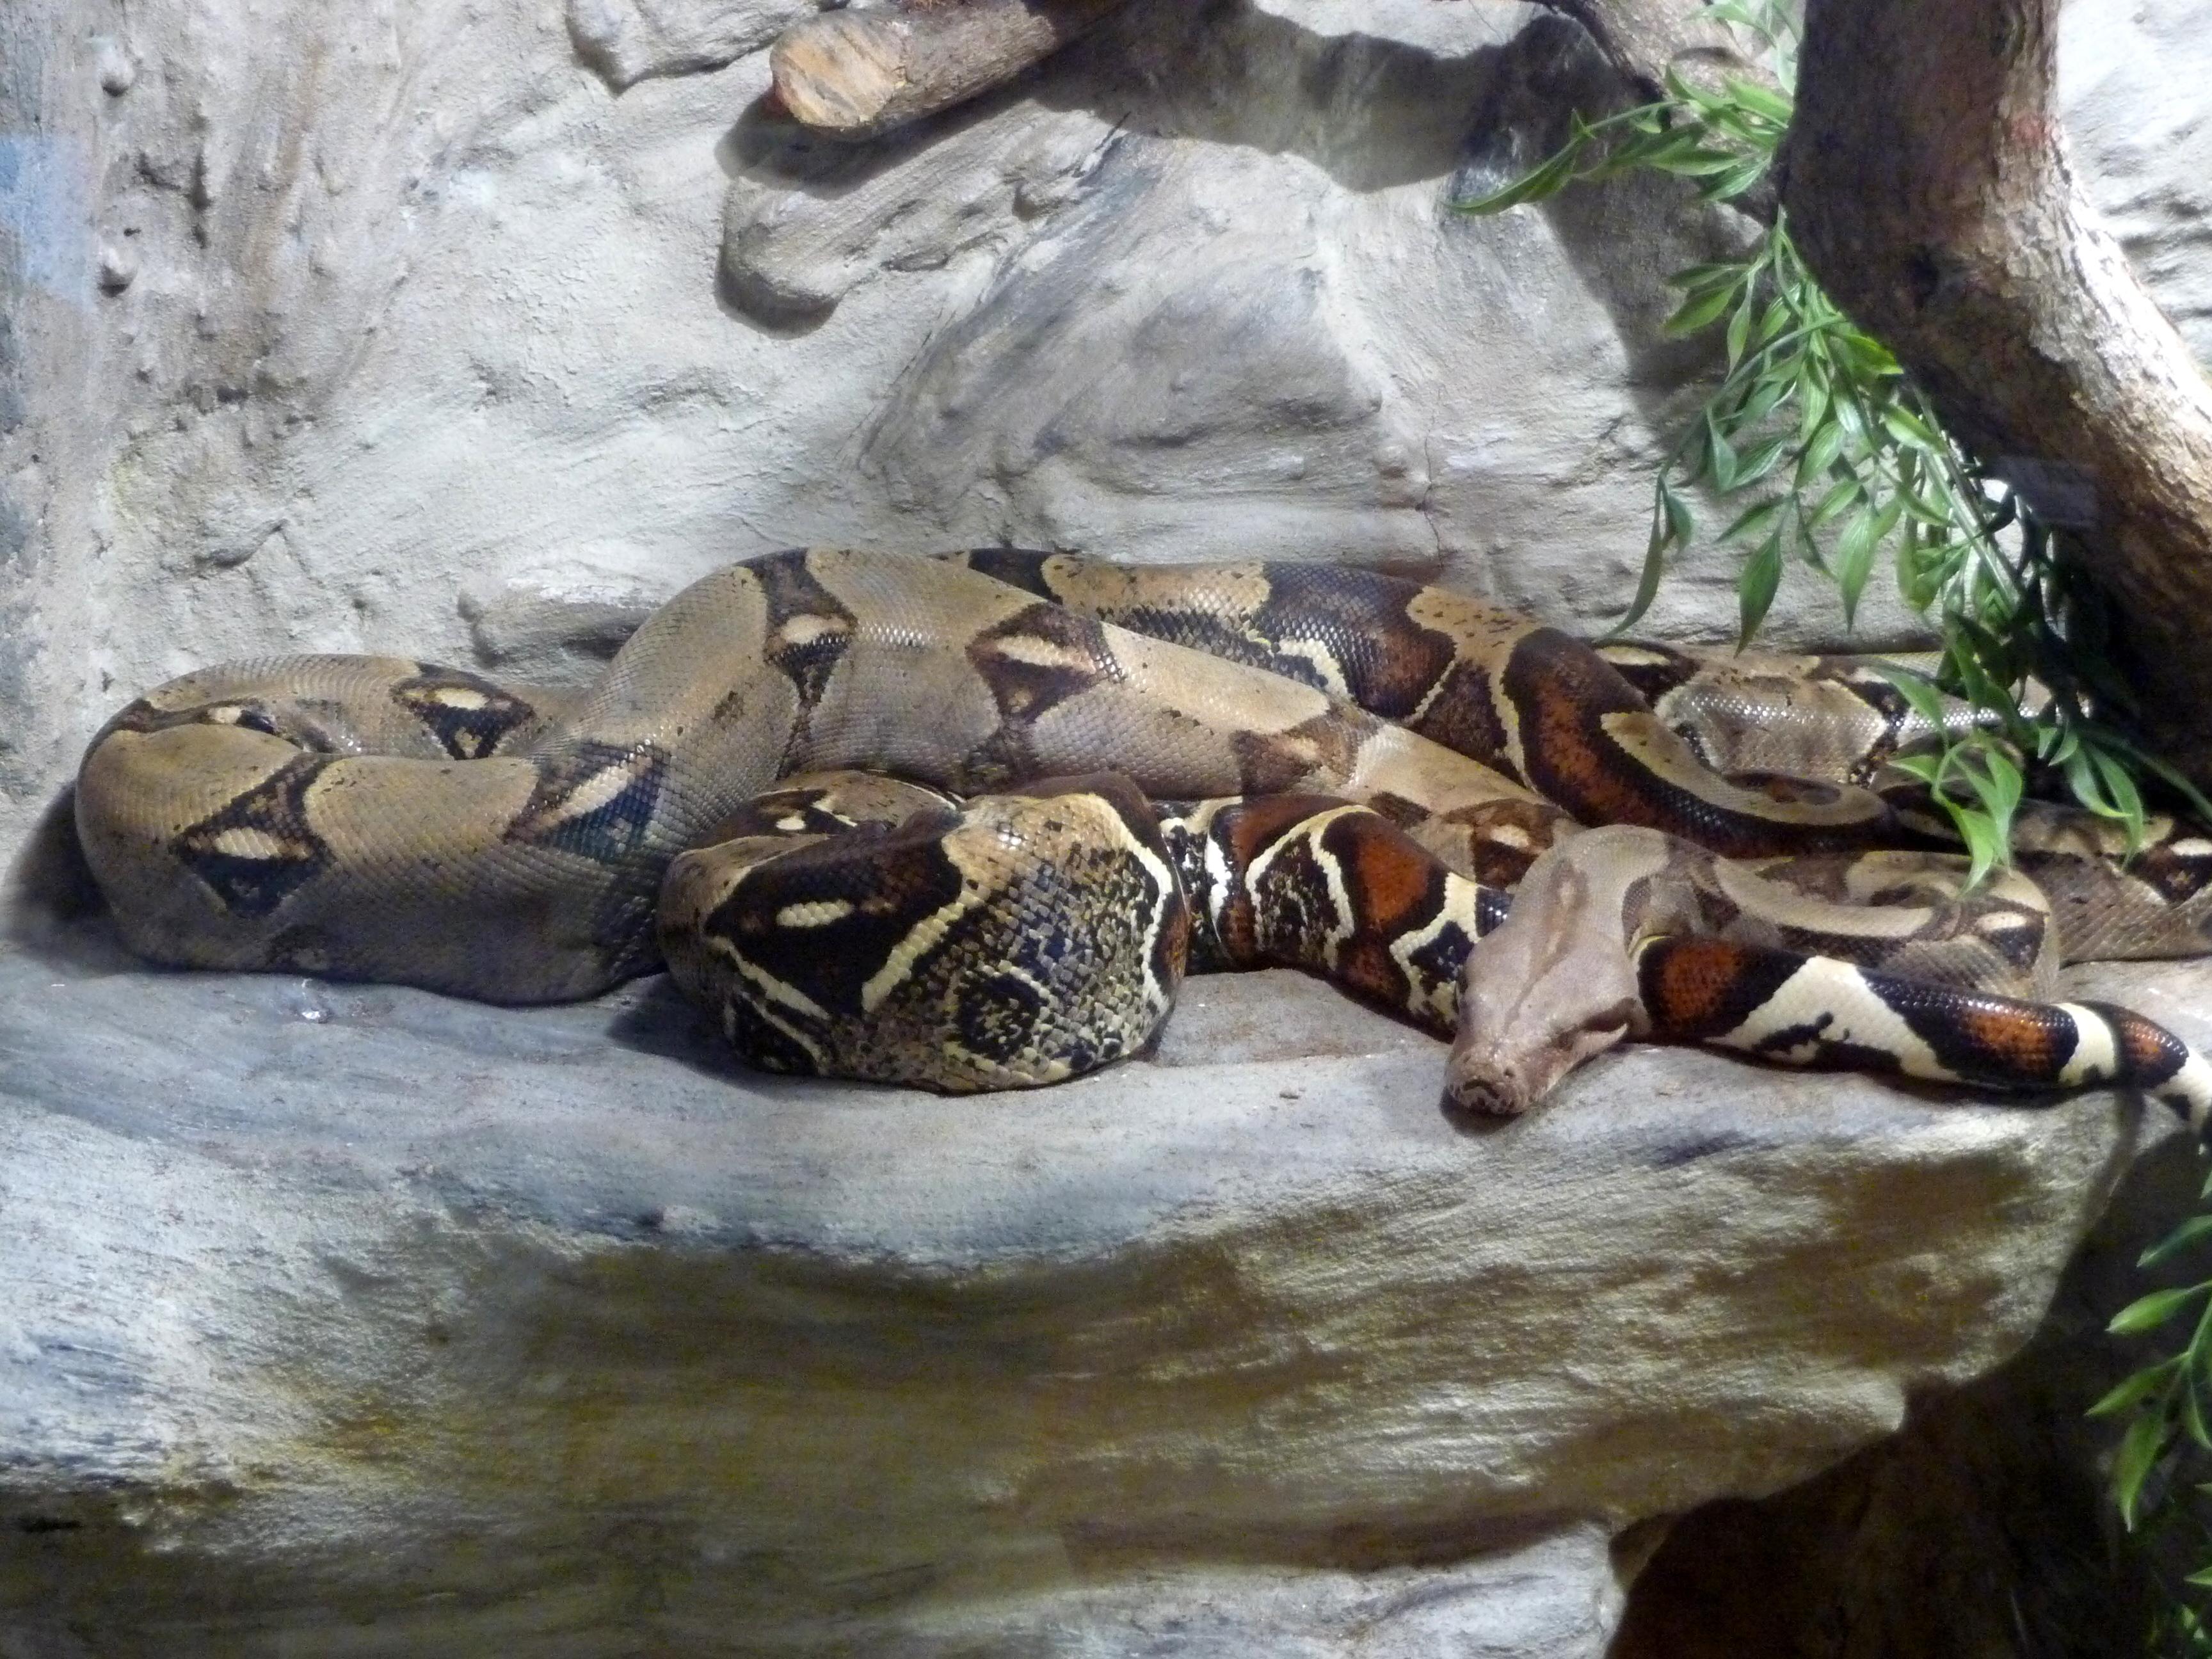 Angel boris in boa vs python 4